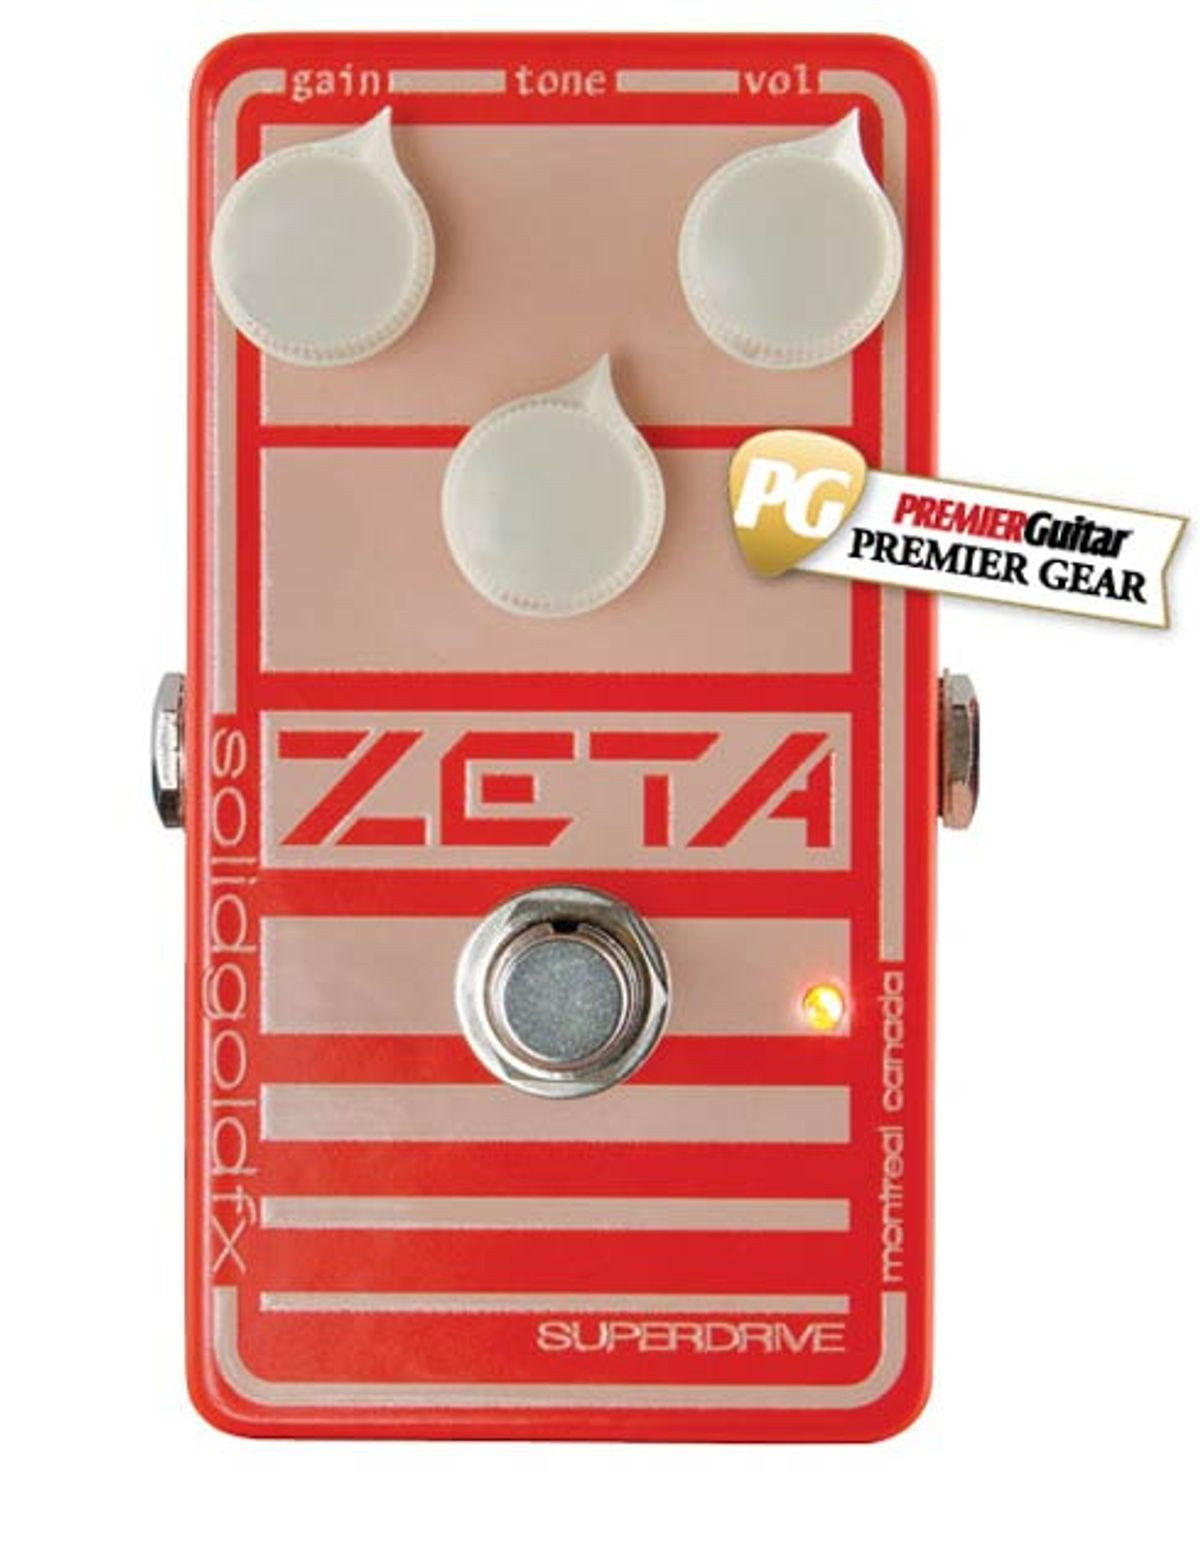 SolidGoldFX Zeta Review